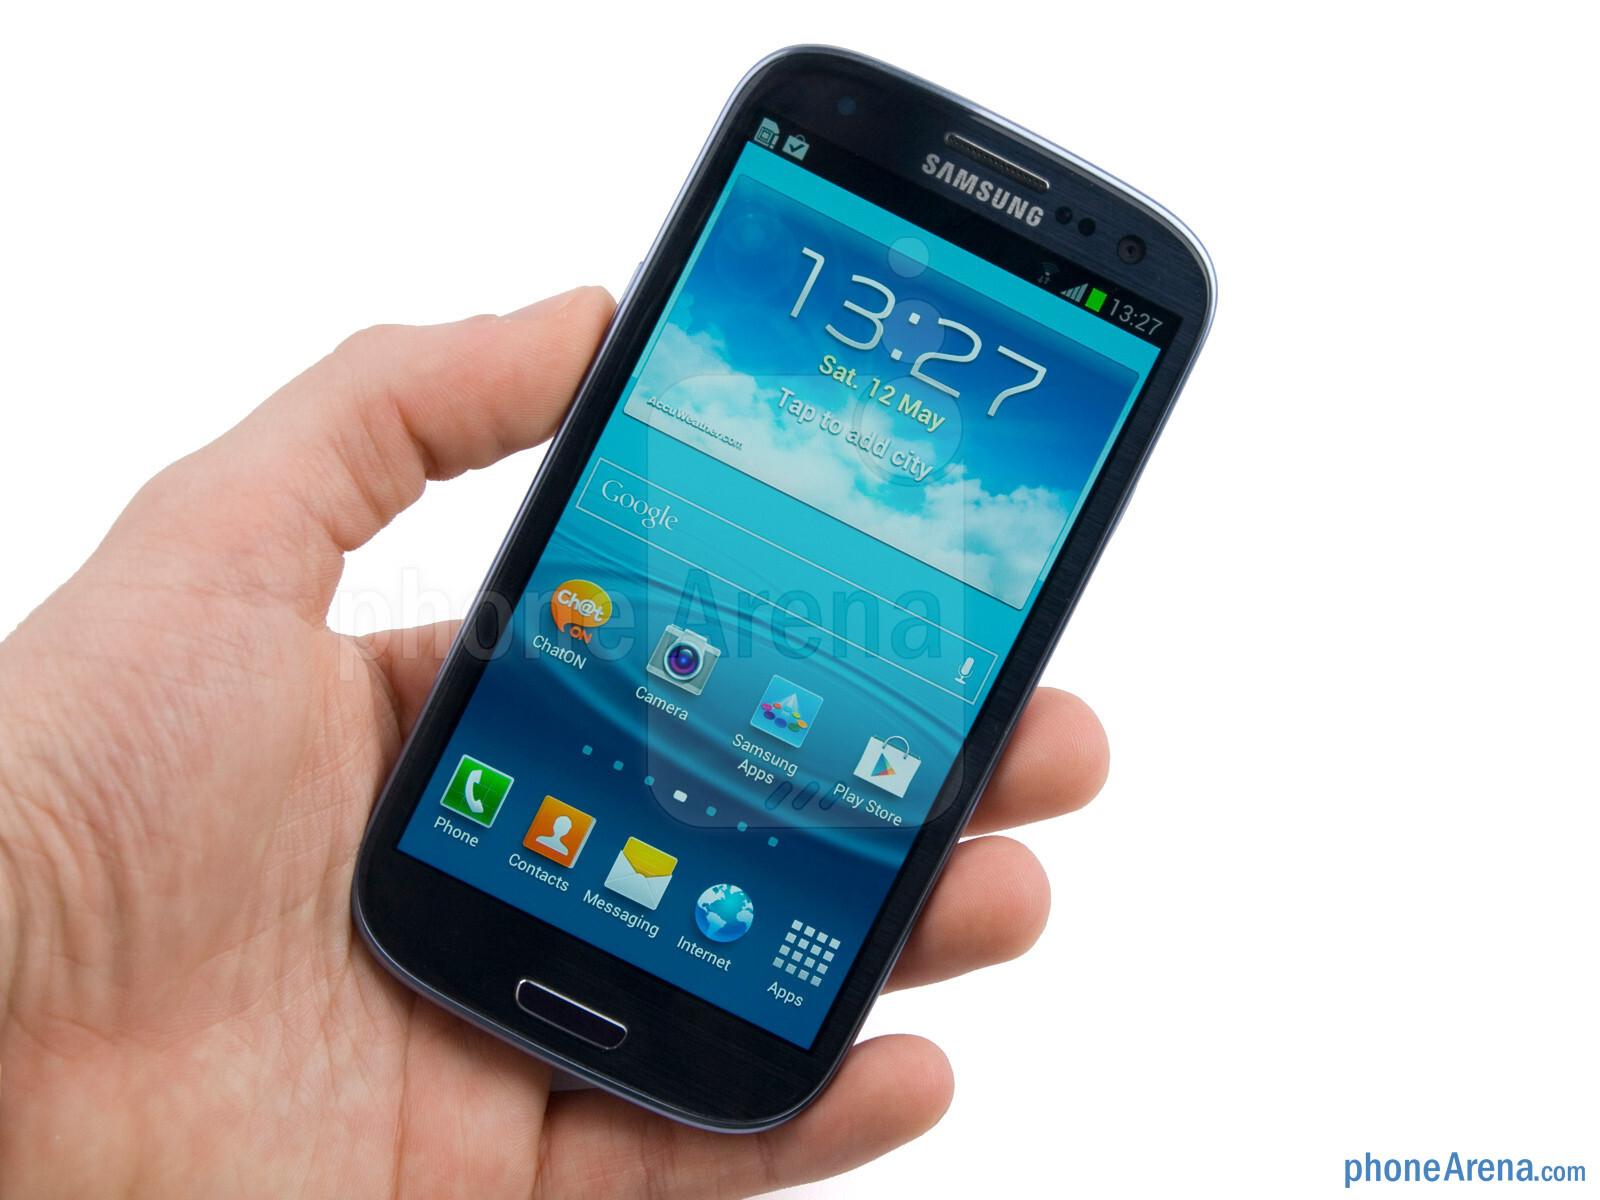 Samsung Galaxy S III: 10 Must-Know Tips and Tricks | CIO